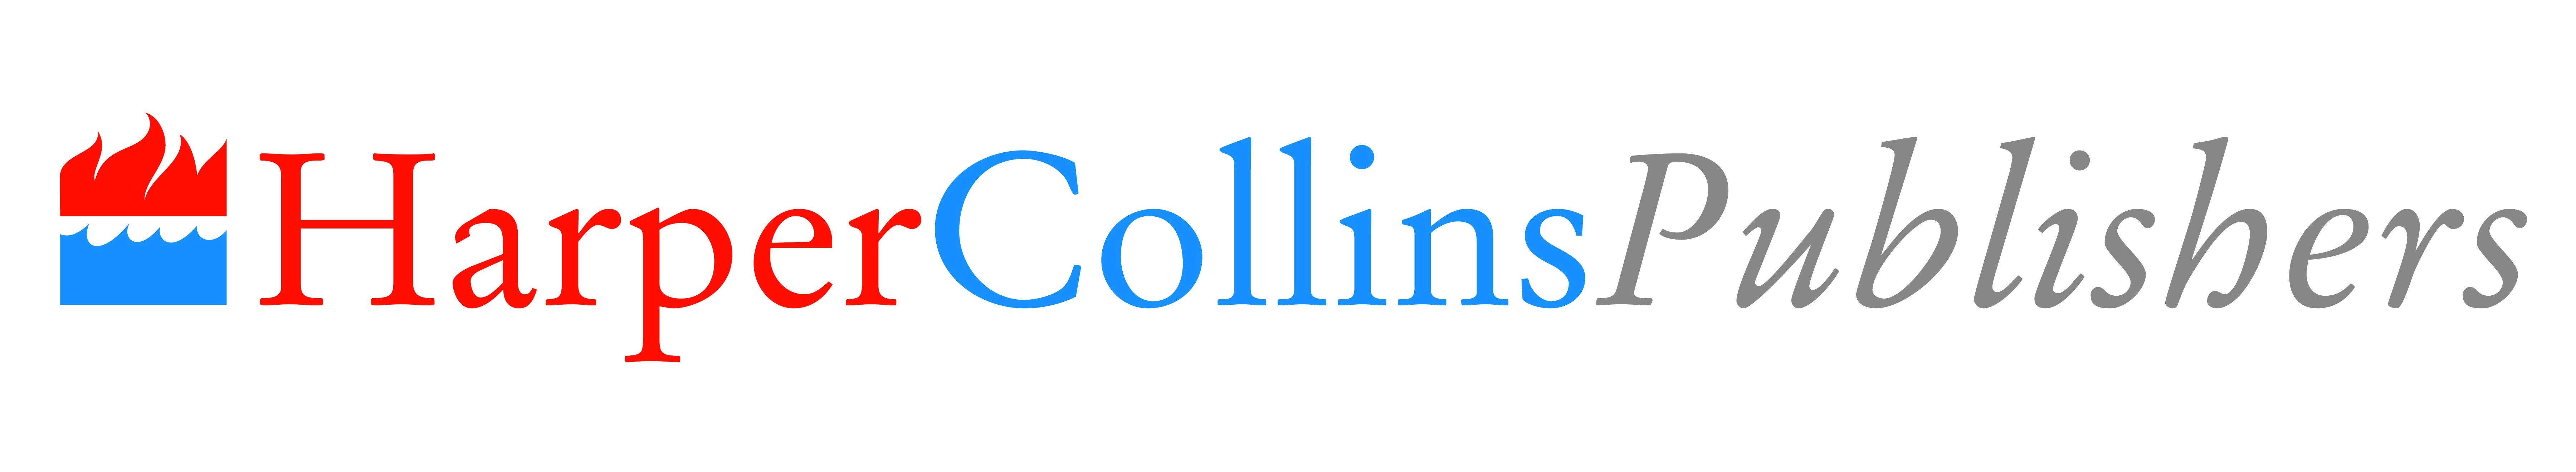 Resultado de imagem para harper collins publisher